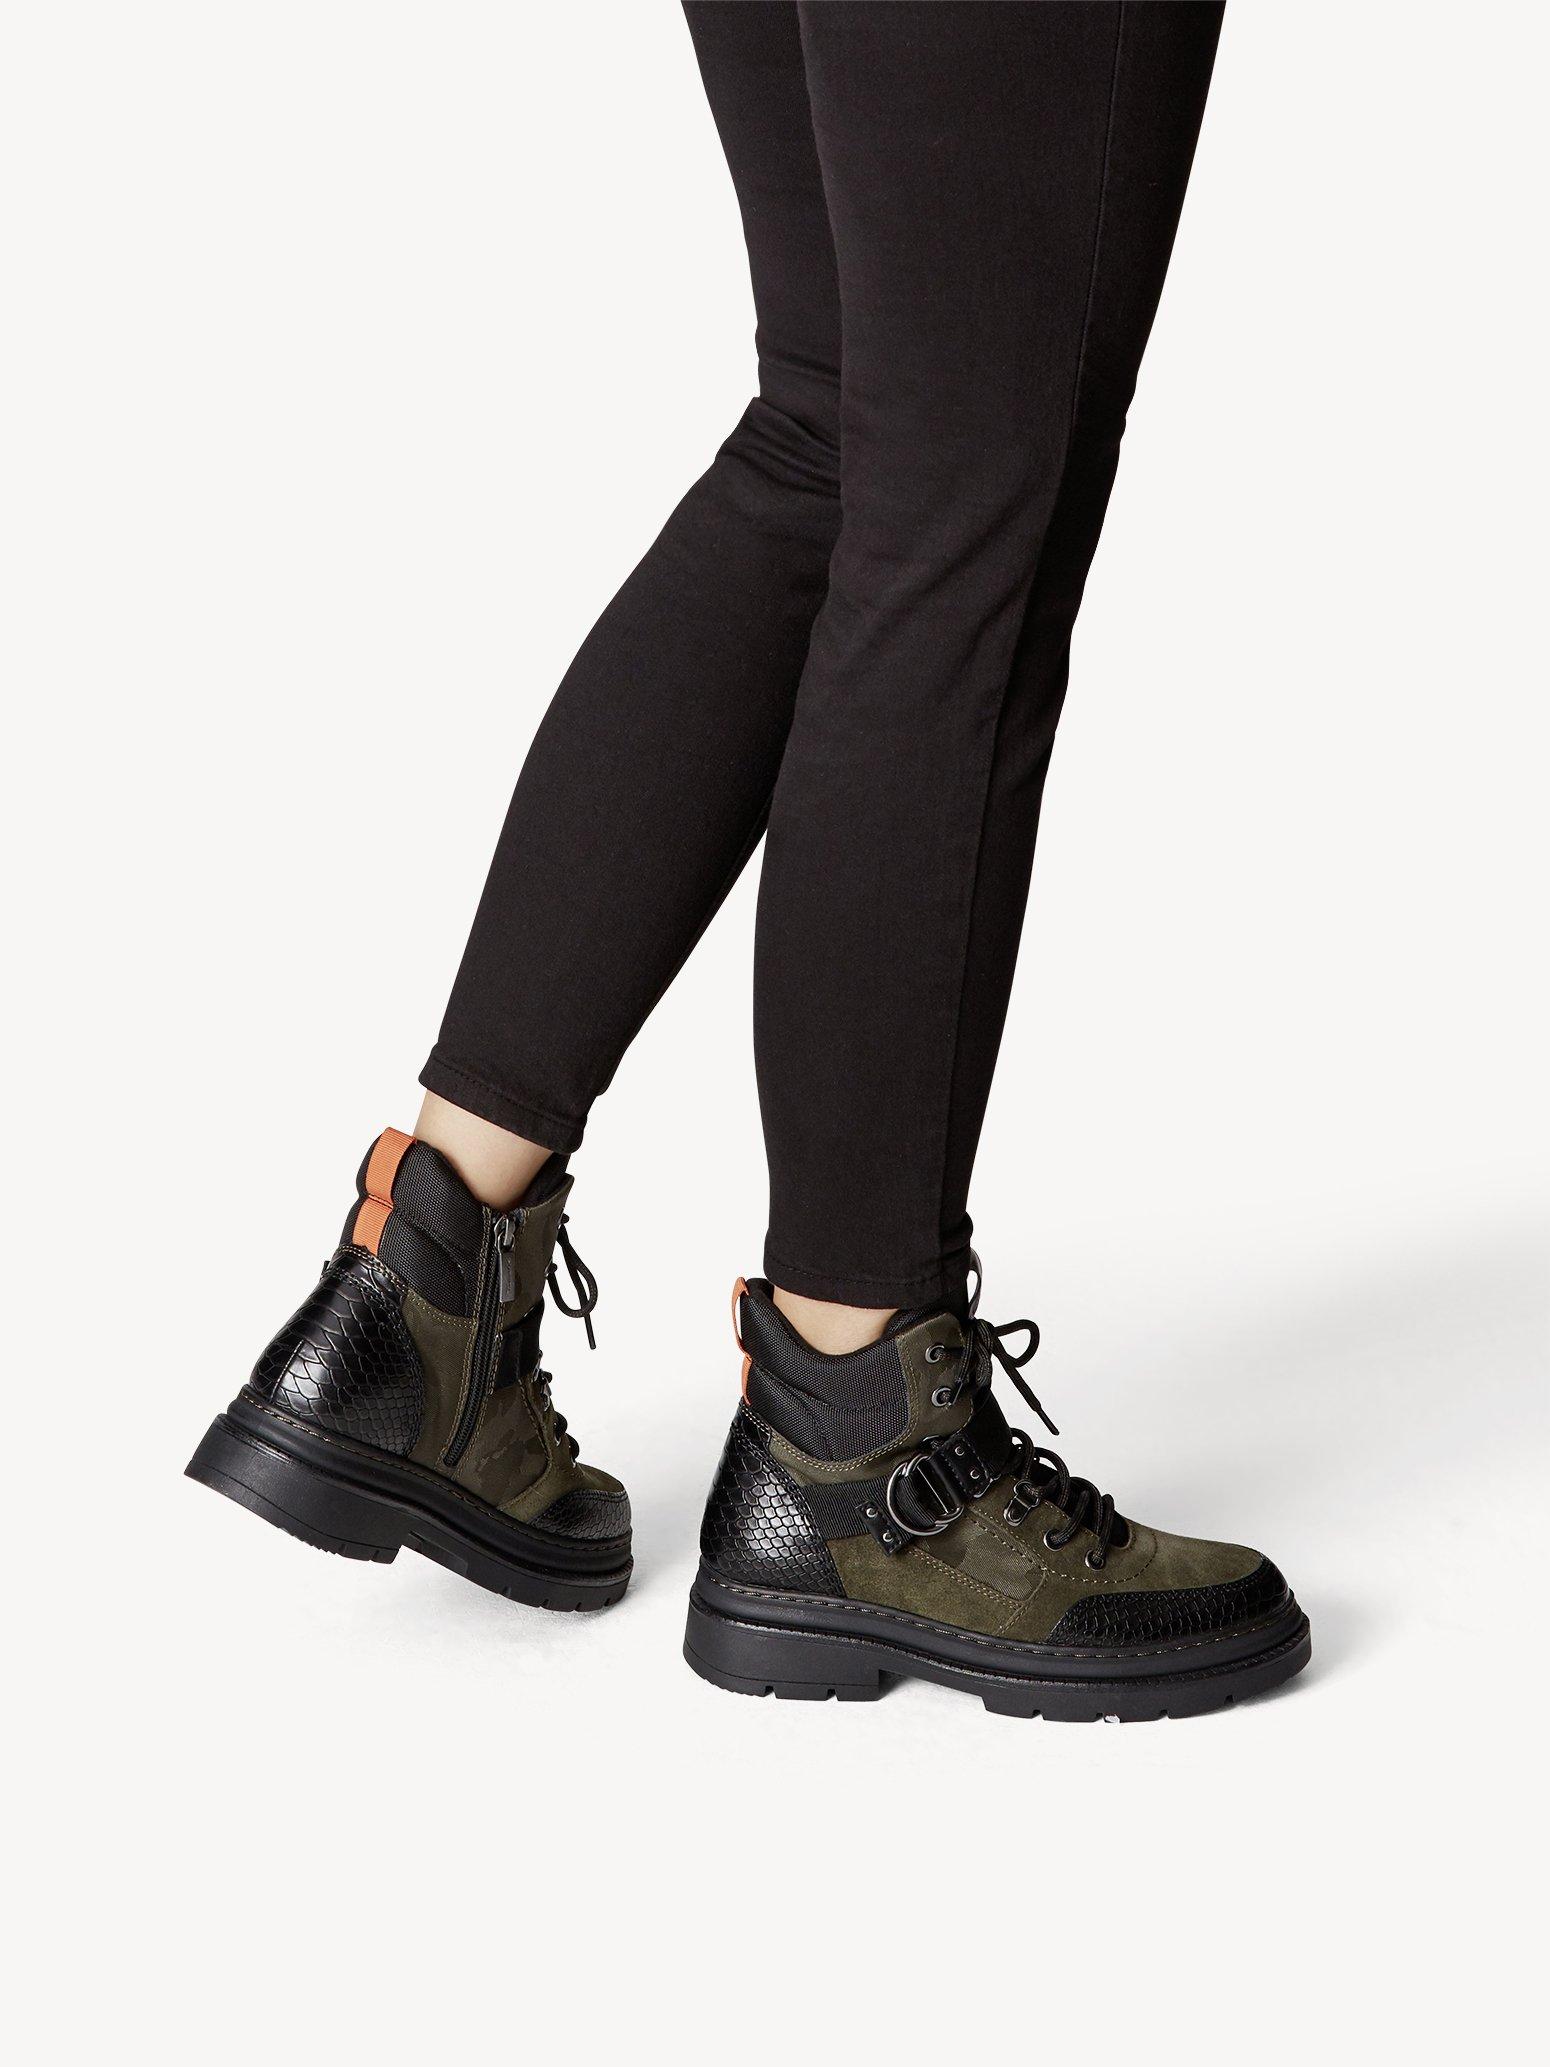 Ботинки Tamaris 1-1-26277-27-761